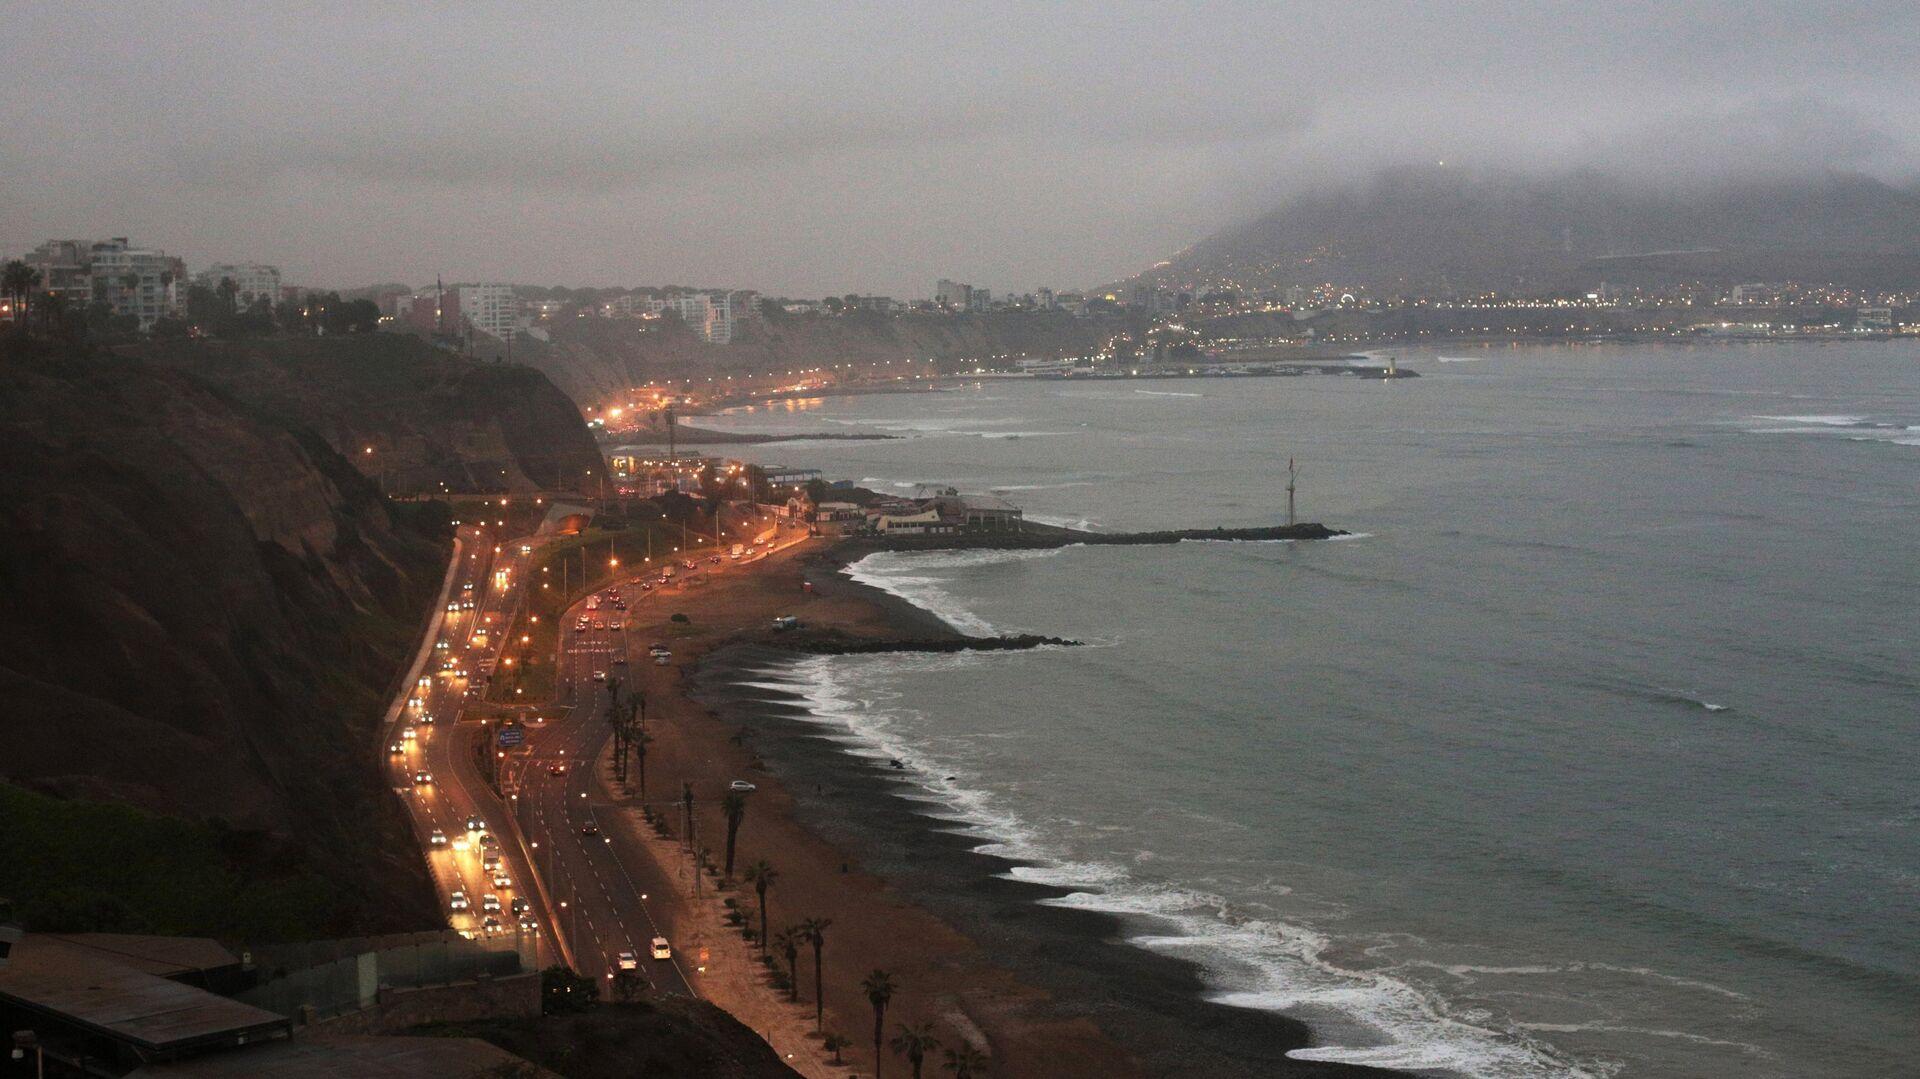 Lima, Perù - Sputnik Italia, 1920, 30.08.2021